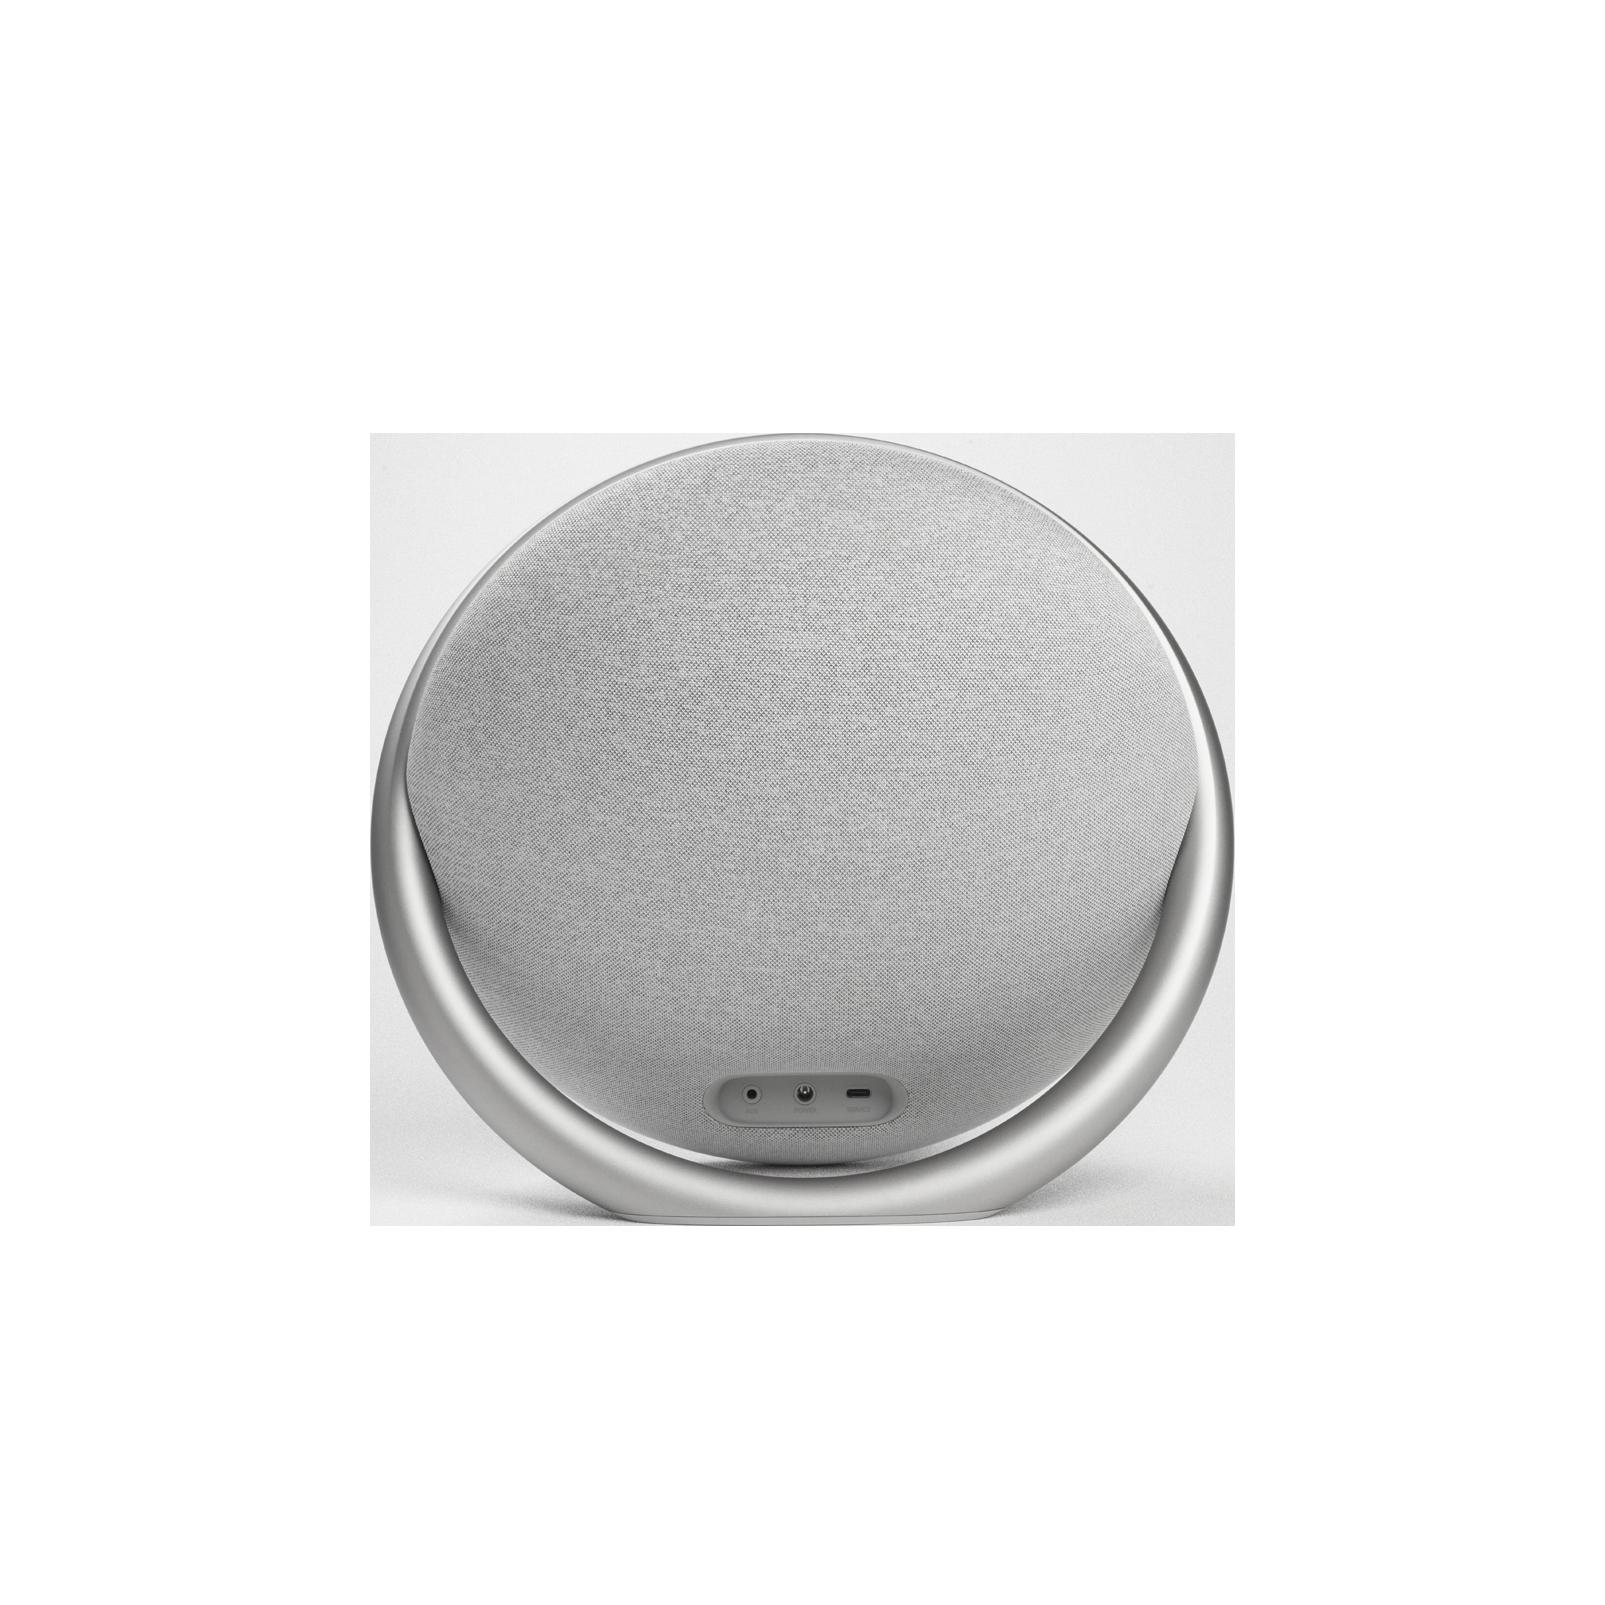 Onyx Studio 7 - Grey - Portable Stereo Bluetooth Speaker - Back